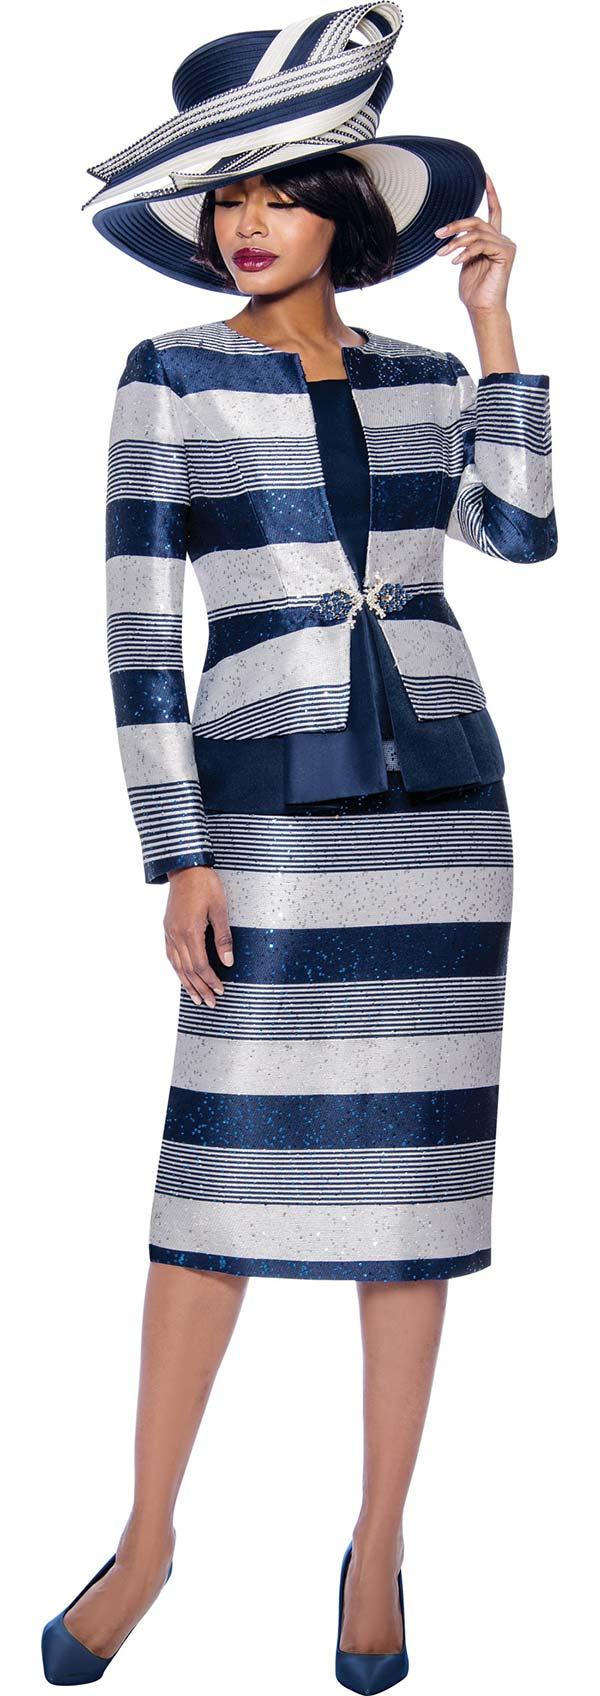 Susanna 3927-Navy - Multi Stripe Design Three Piece Skirt Suit